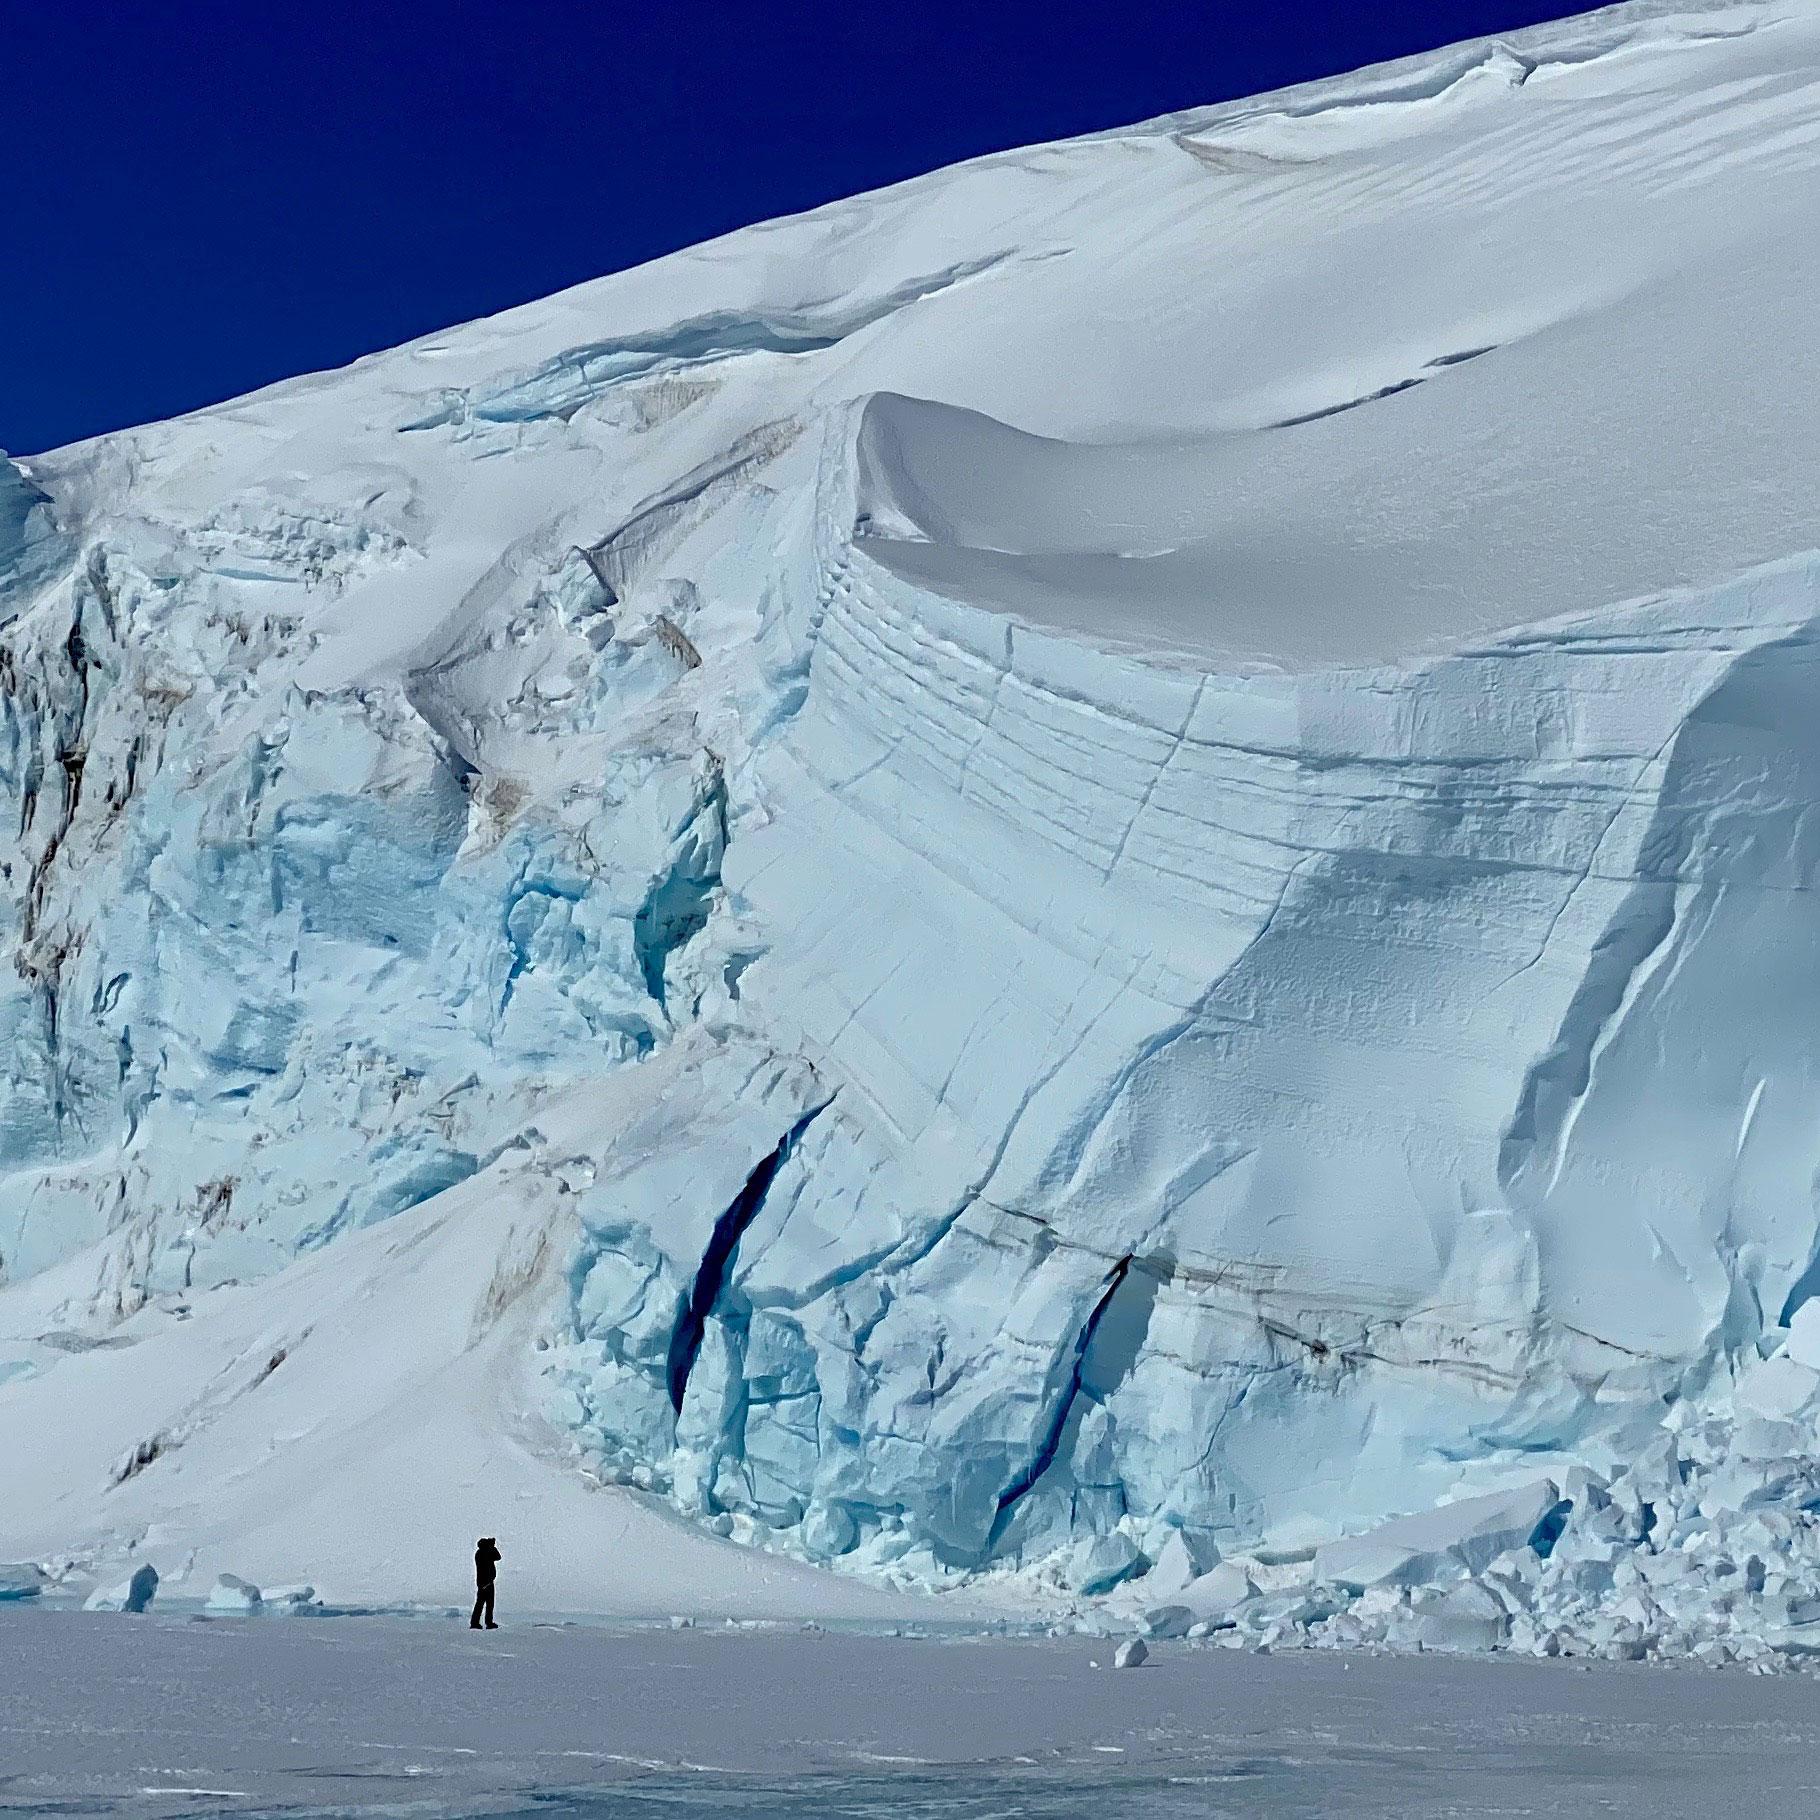 Walking among giant glaciers in Antarctica